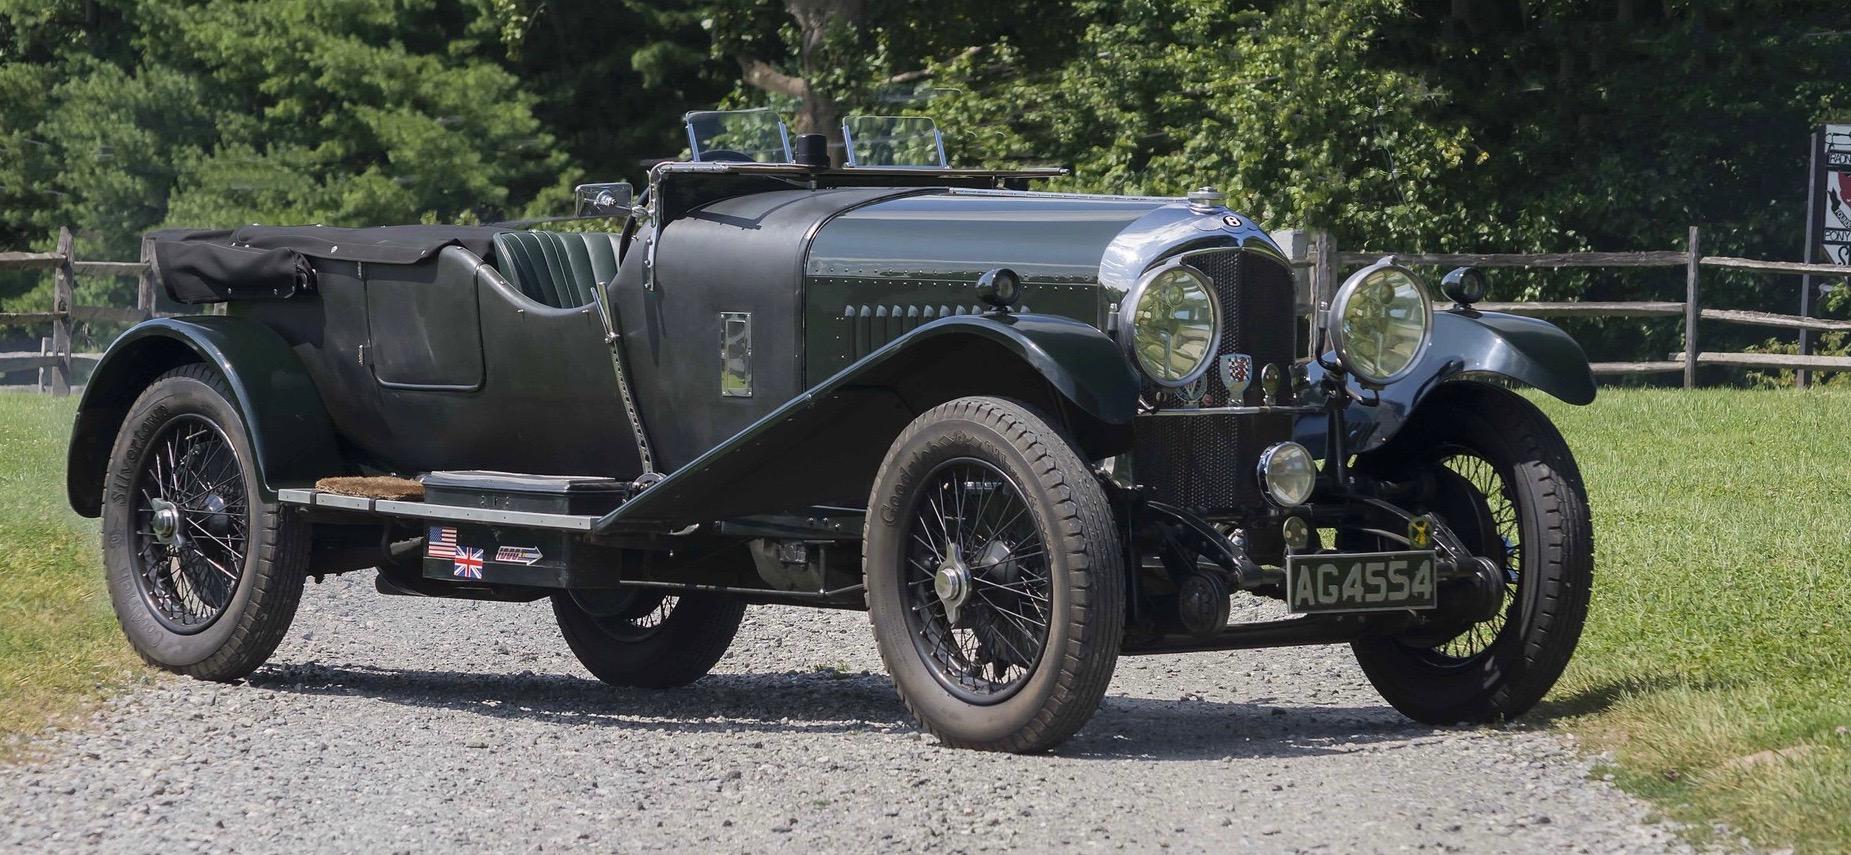 , Pre-war Bentleys join docket for Bonhams auction at Simeone museum, ClassicCars.com Journal